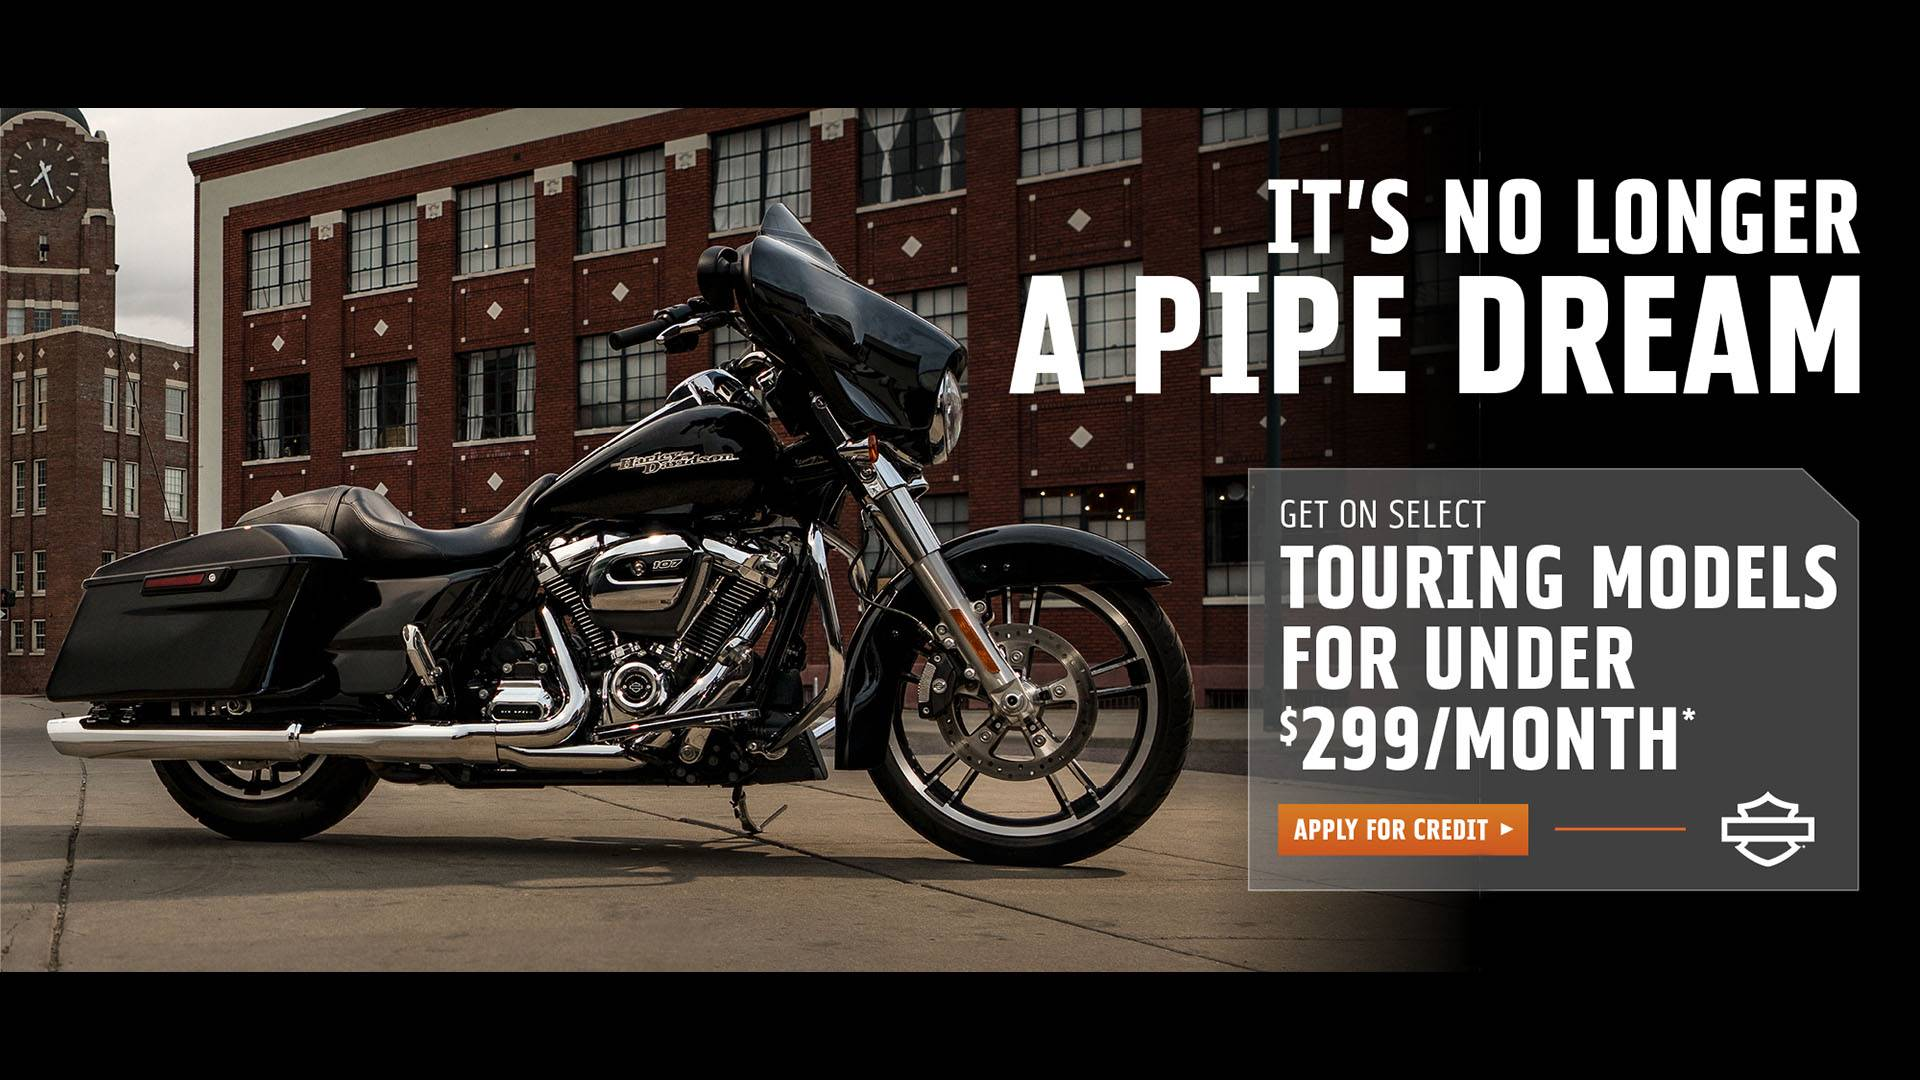 Zylstra Harley Davidson Dealers In Ames Iowa Harley Bikes Trikes